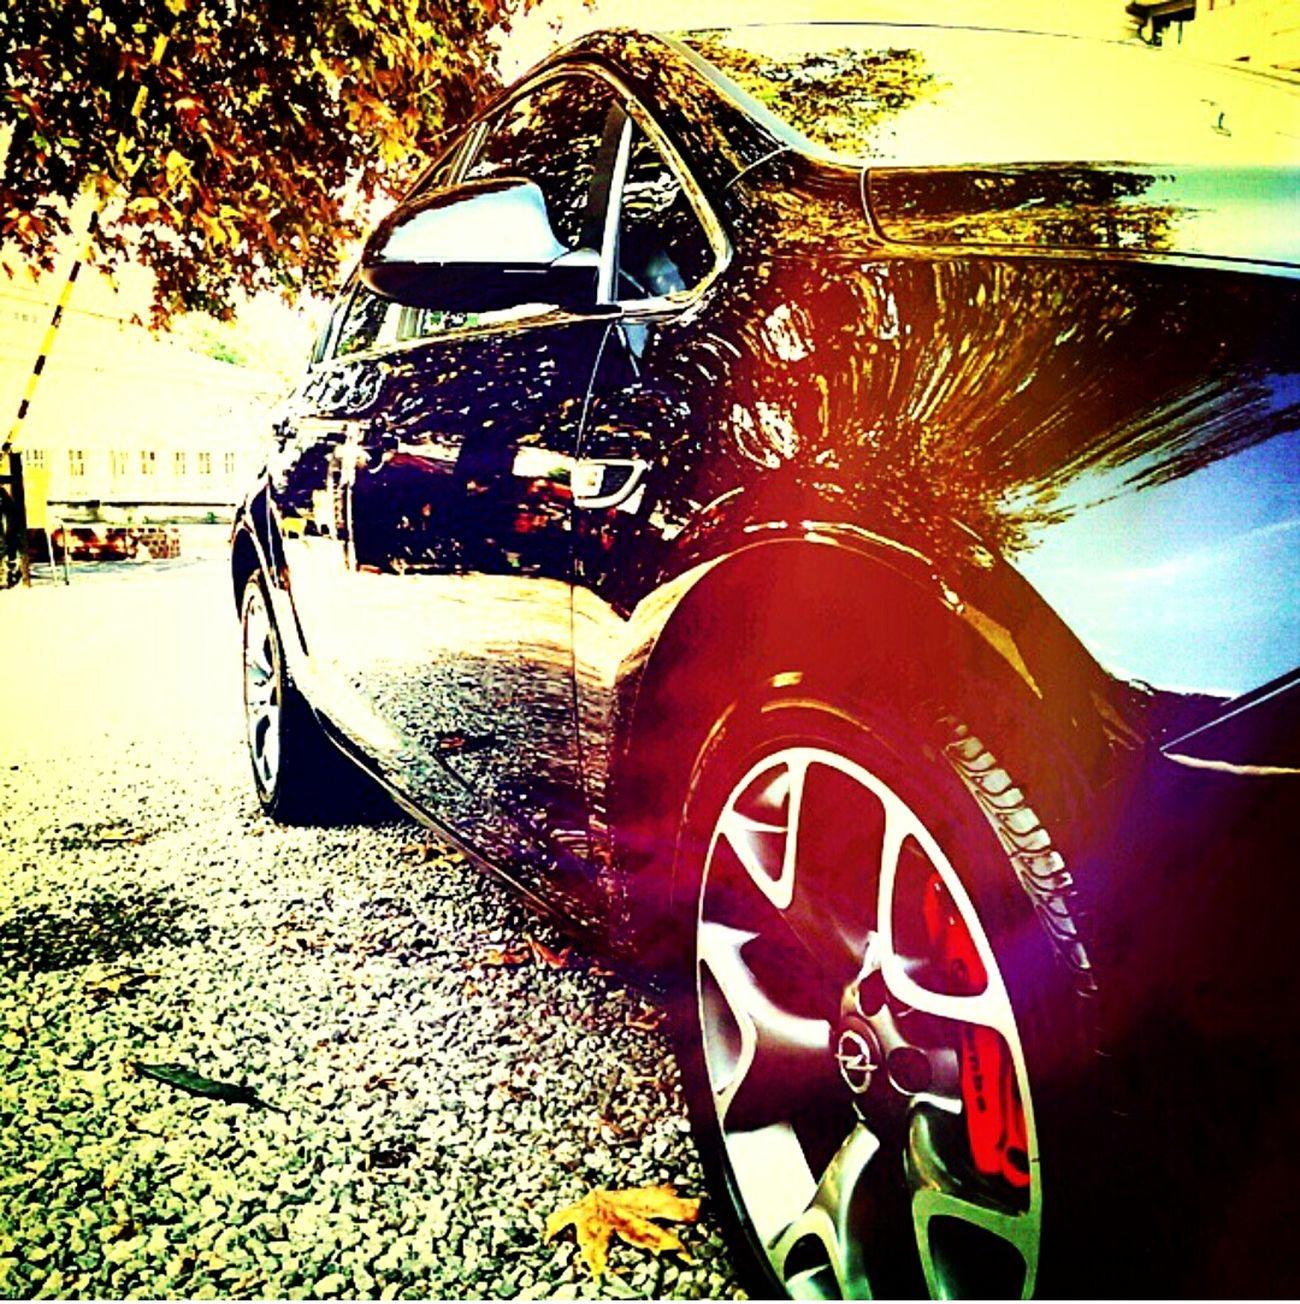 Astraj Rockford Rockford Fosgate OPC Enjoying Life EyeEm Best Shots Opel Astra GTC Opelastra Brembo  Bmc